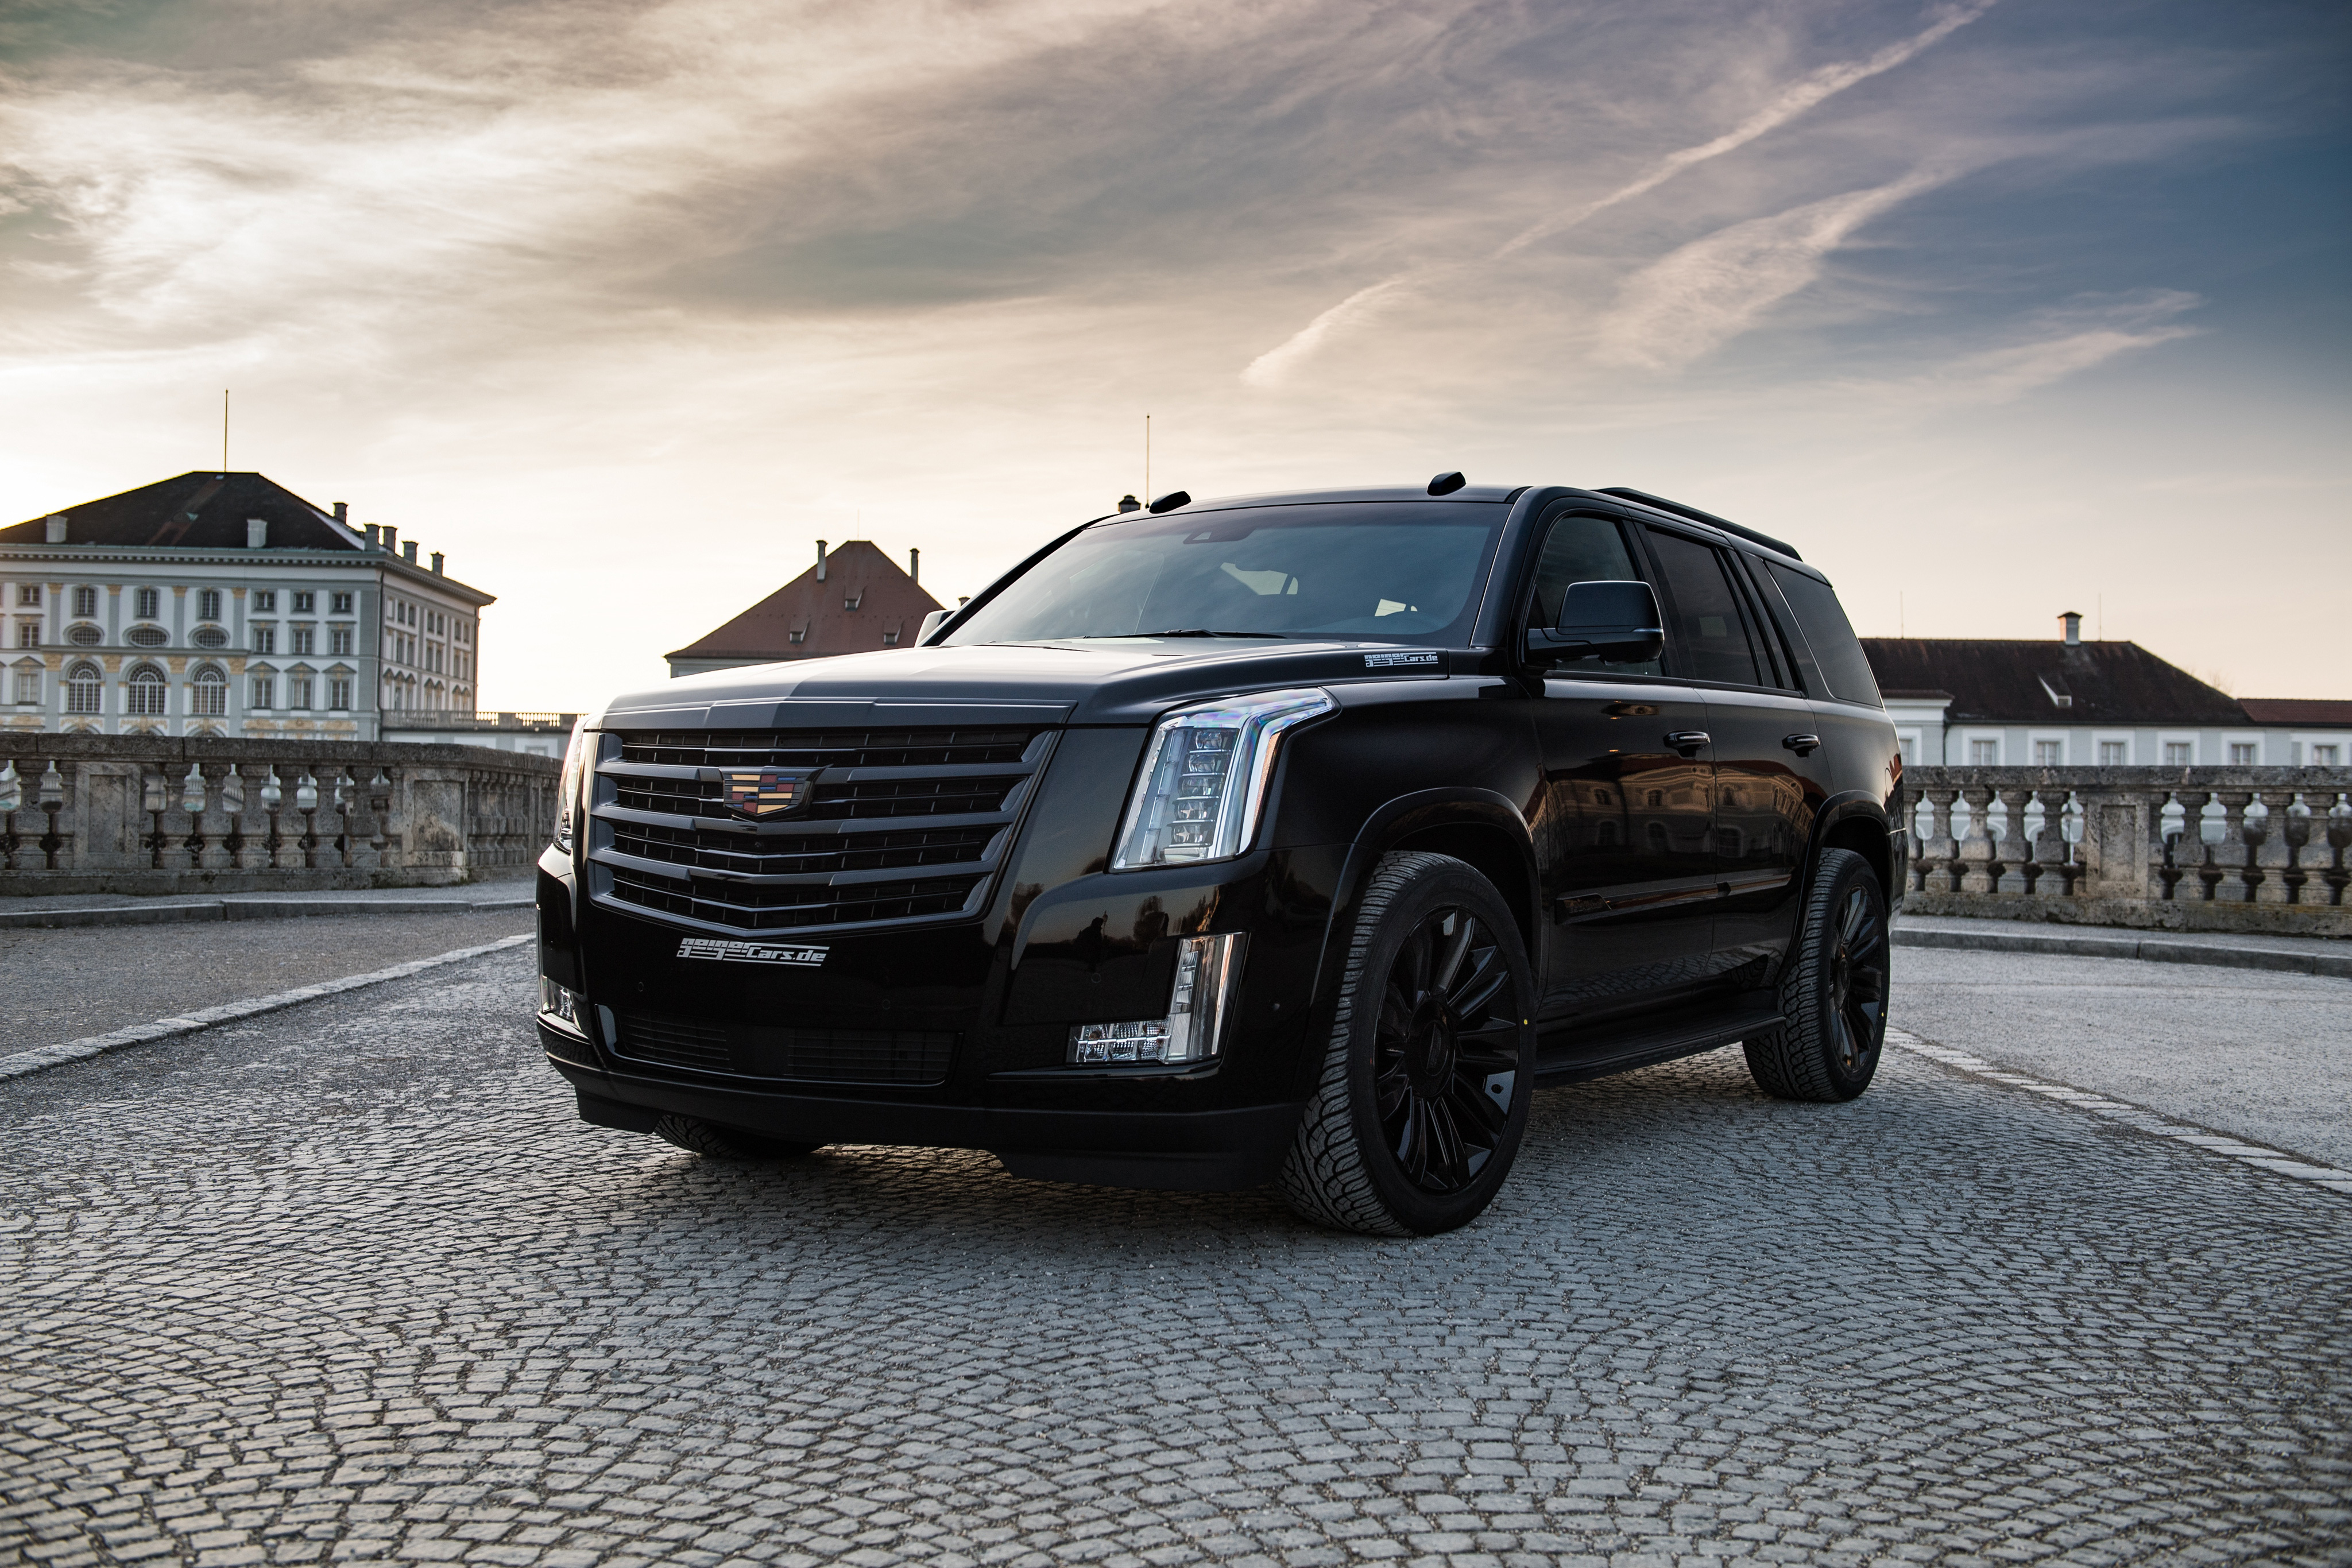 2880x1800 geiger cadillac escalade black edition 2018 - Cadillac wallpaper ...